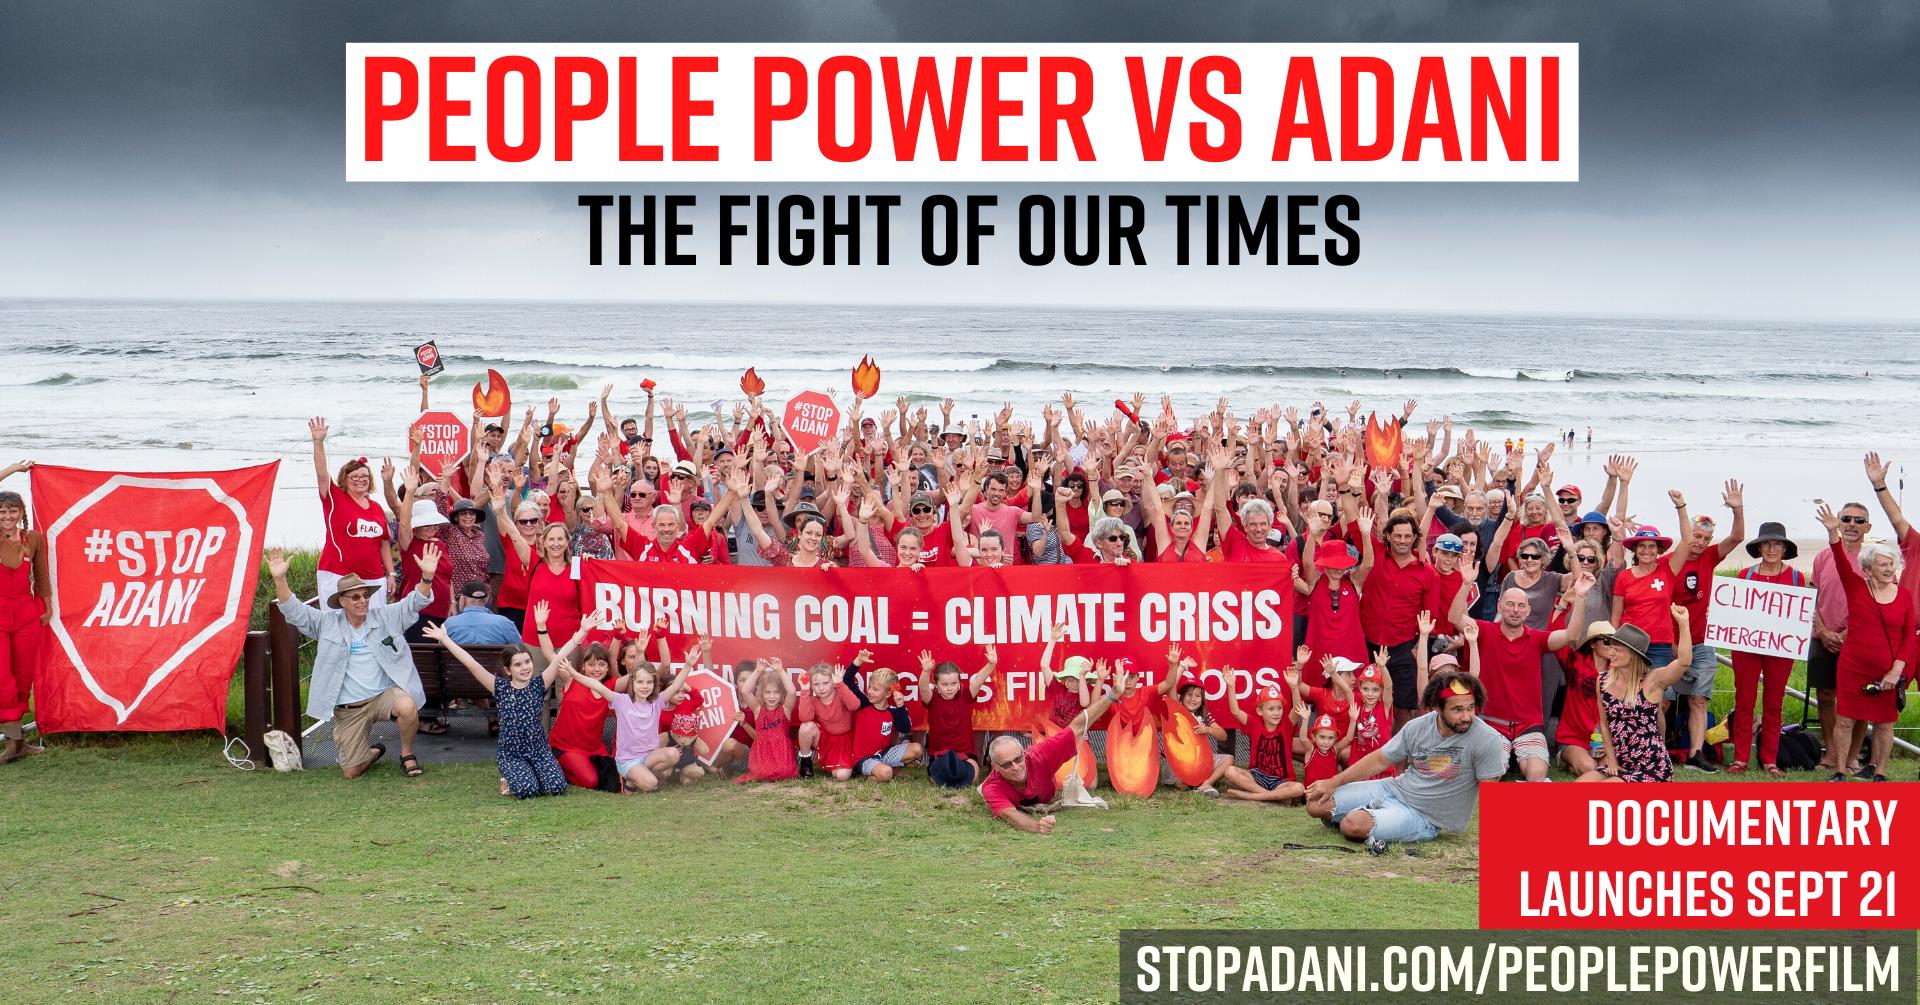 Stop Adani group